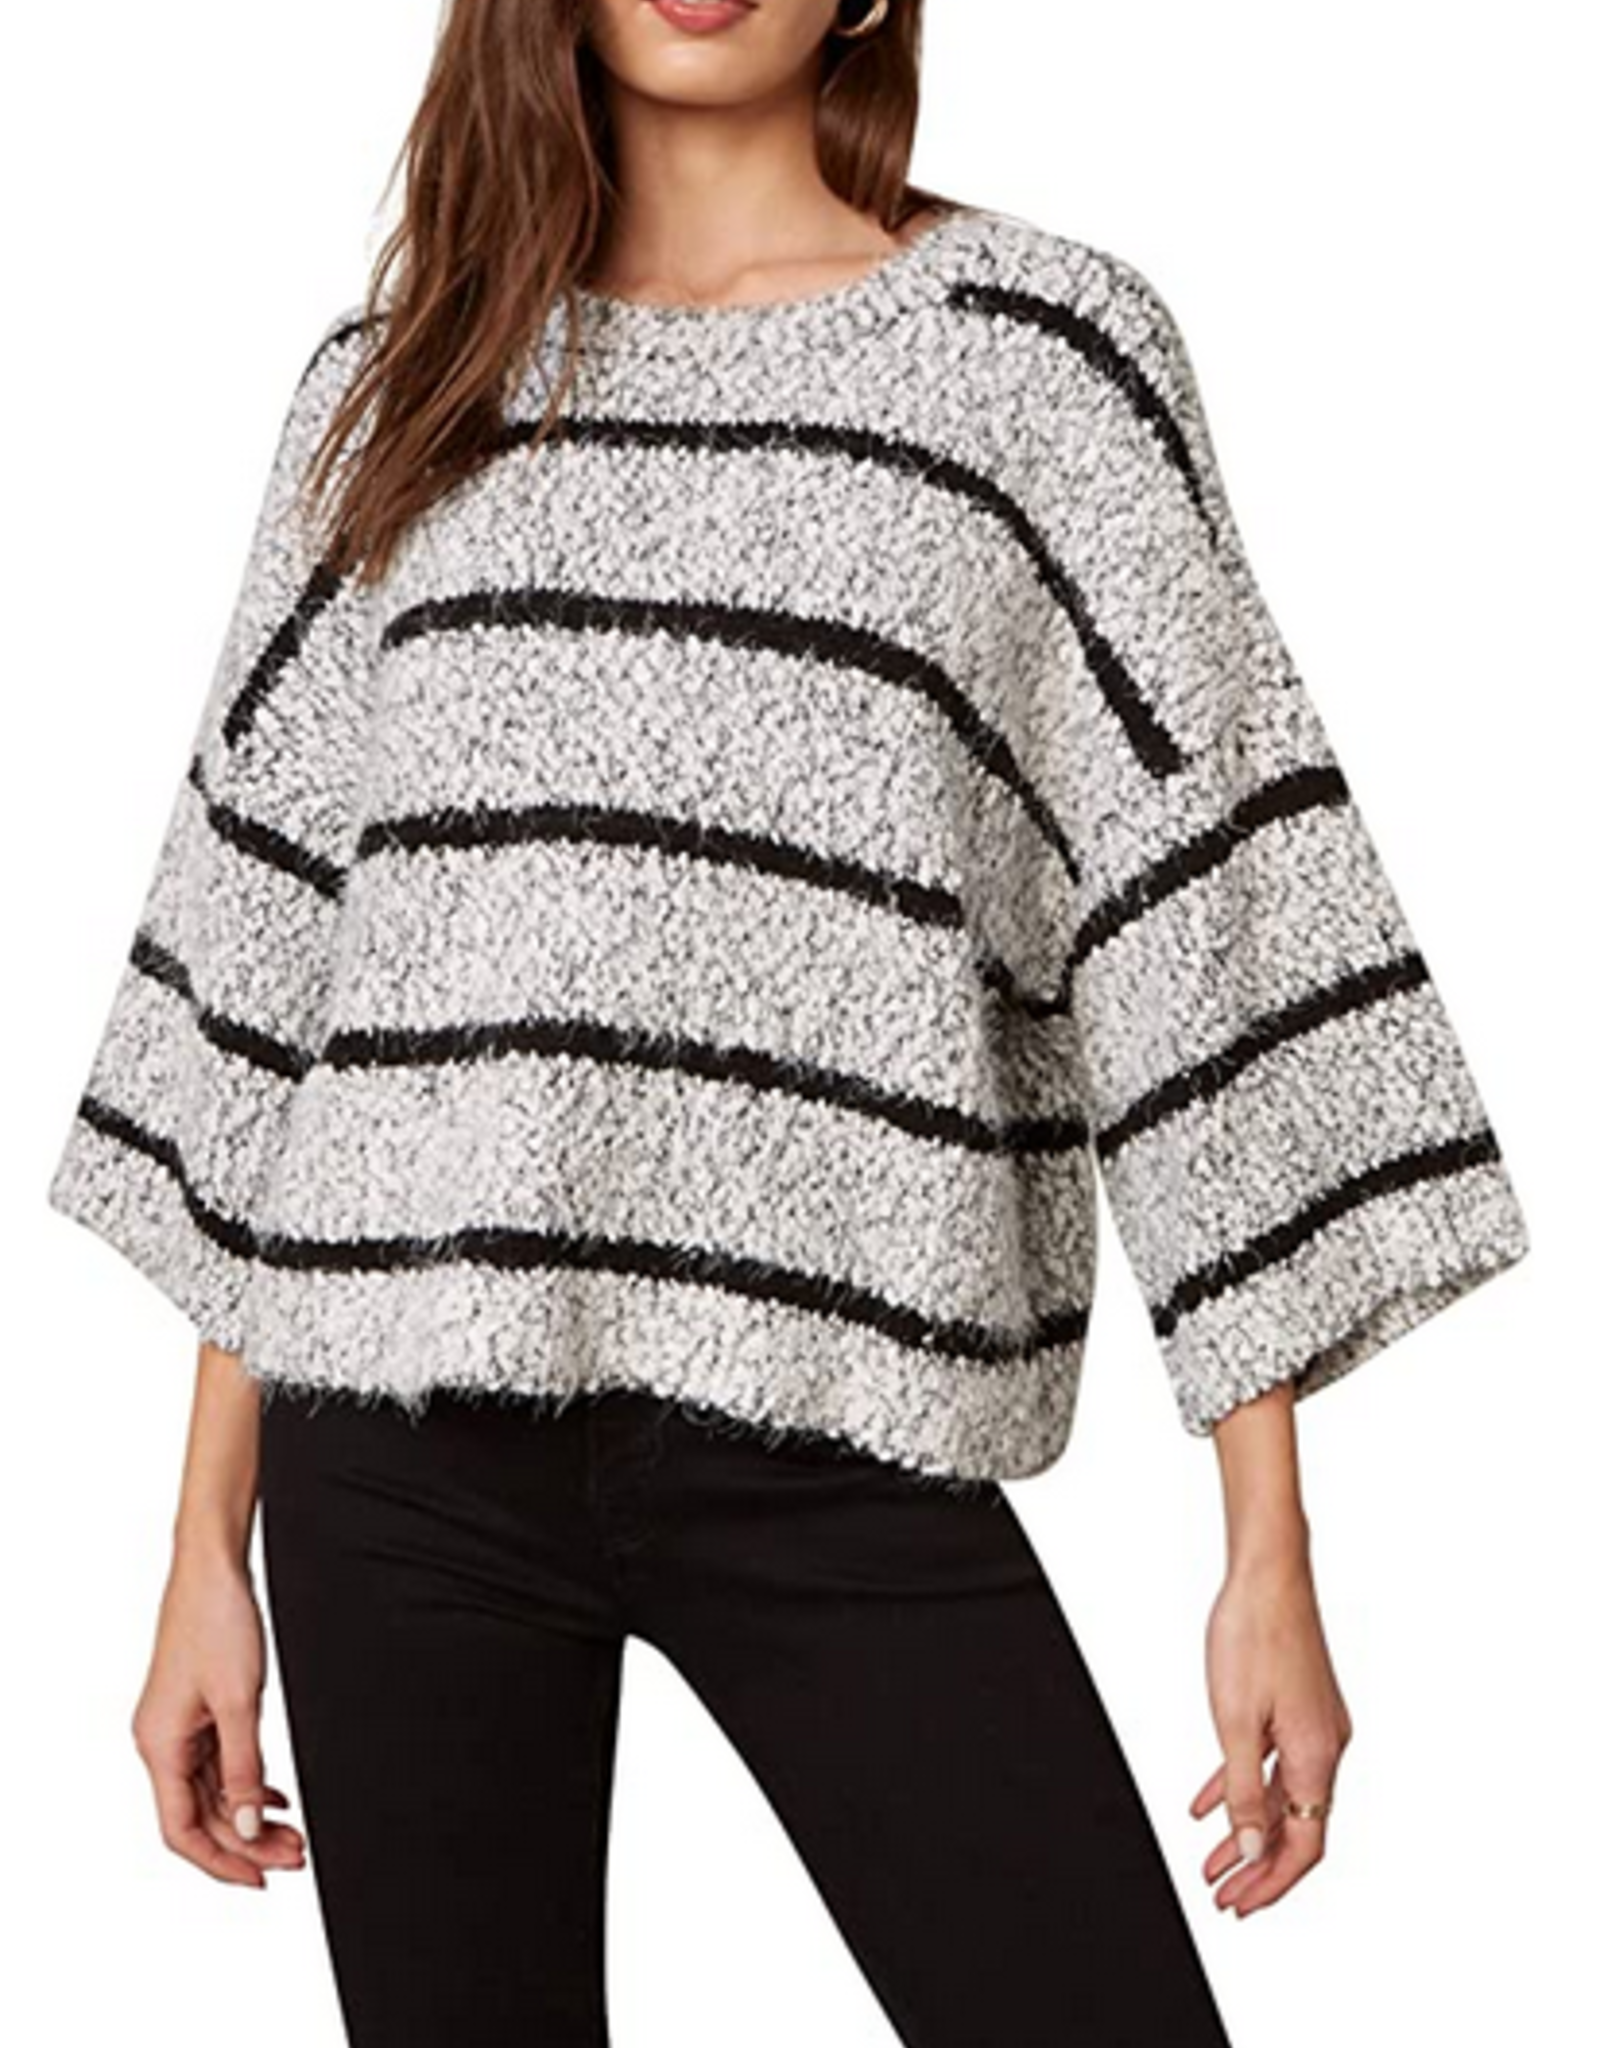 BB Dakota Good Vibes Only Ivory Sweater